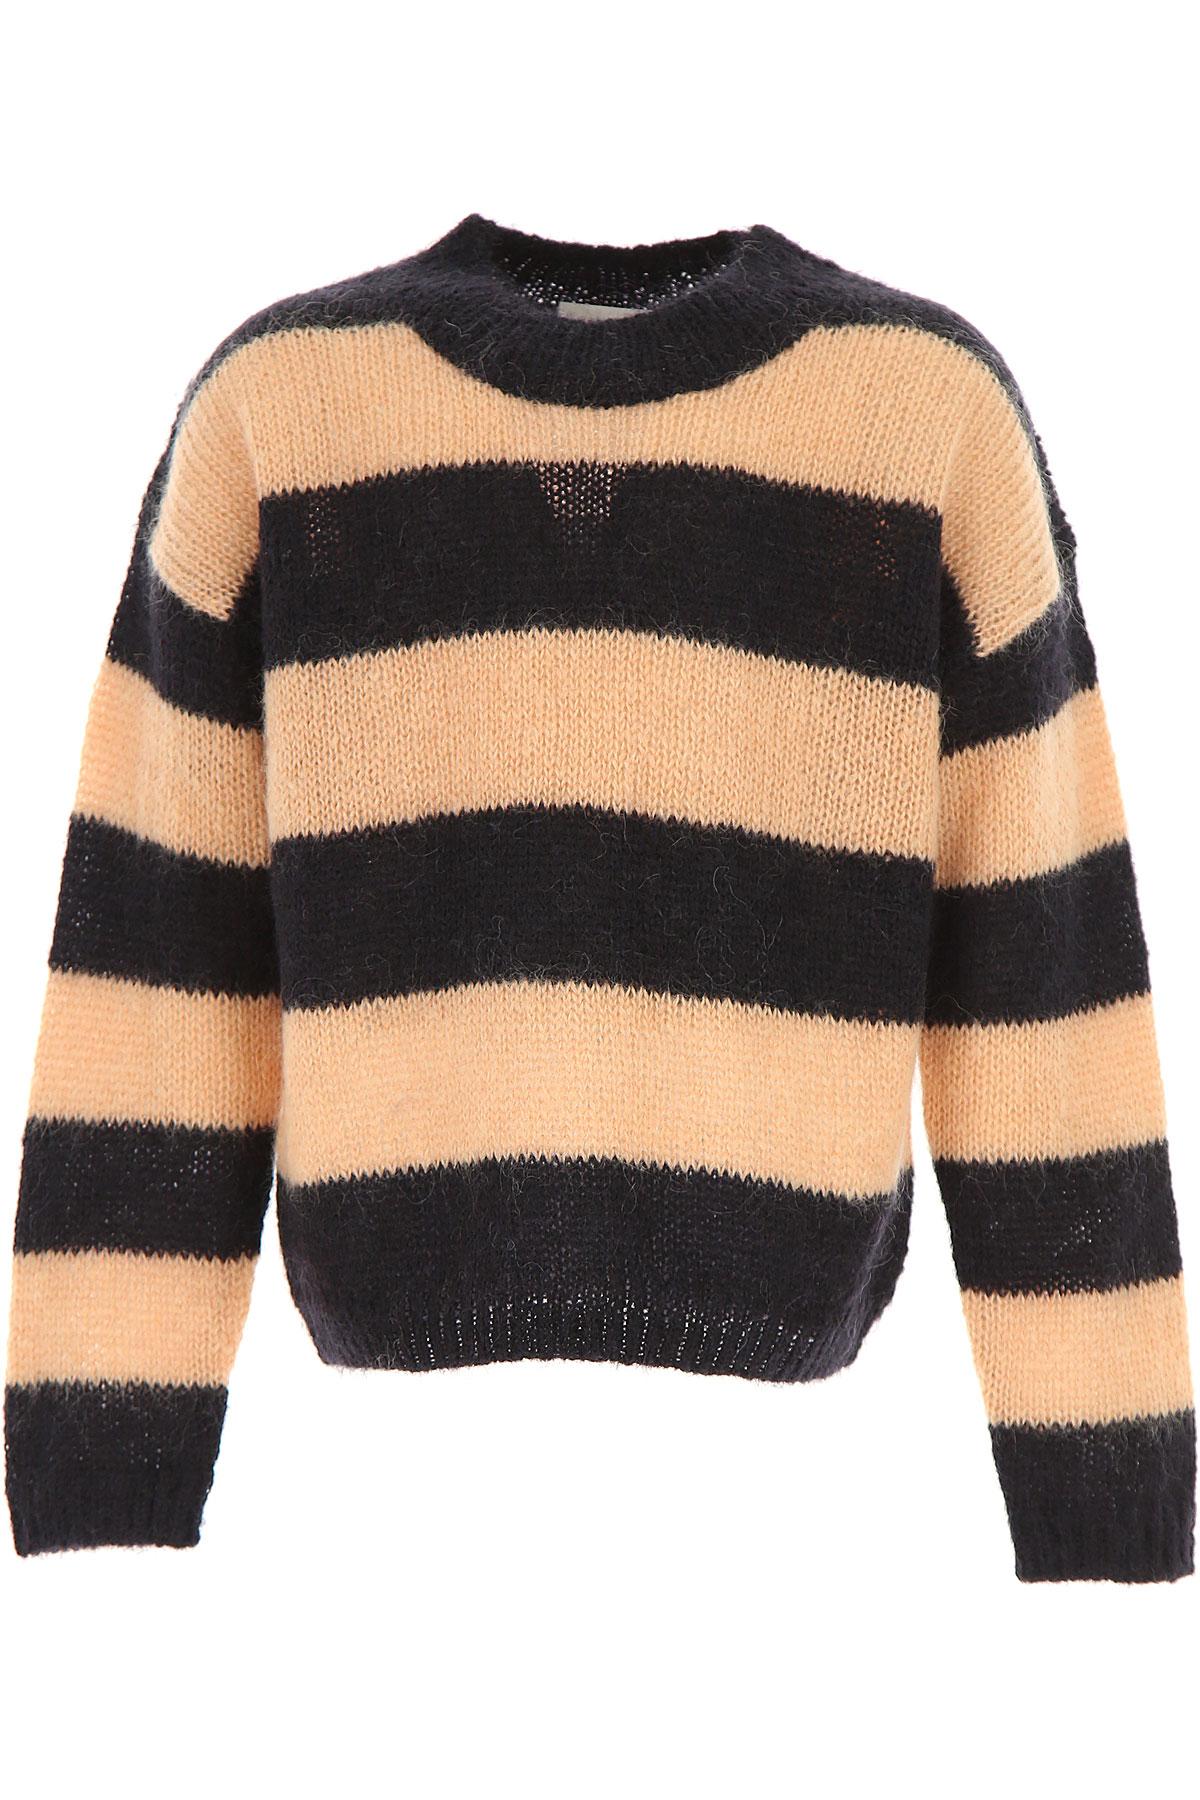 Image of Les Coyotes De Paris Kids Sweaters for Girls, Black, Kid mohair, 2017, 10Y 14Y 8Y